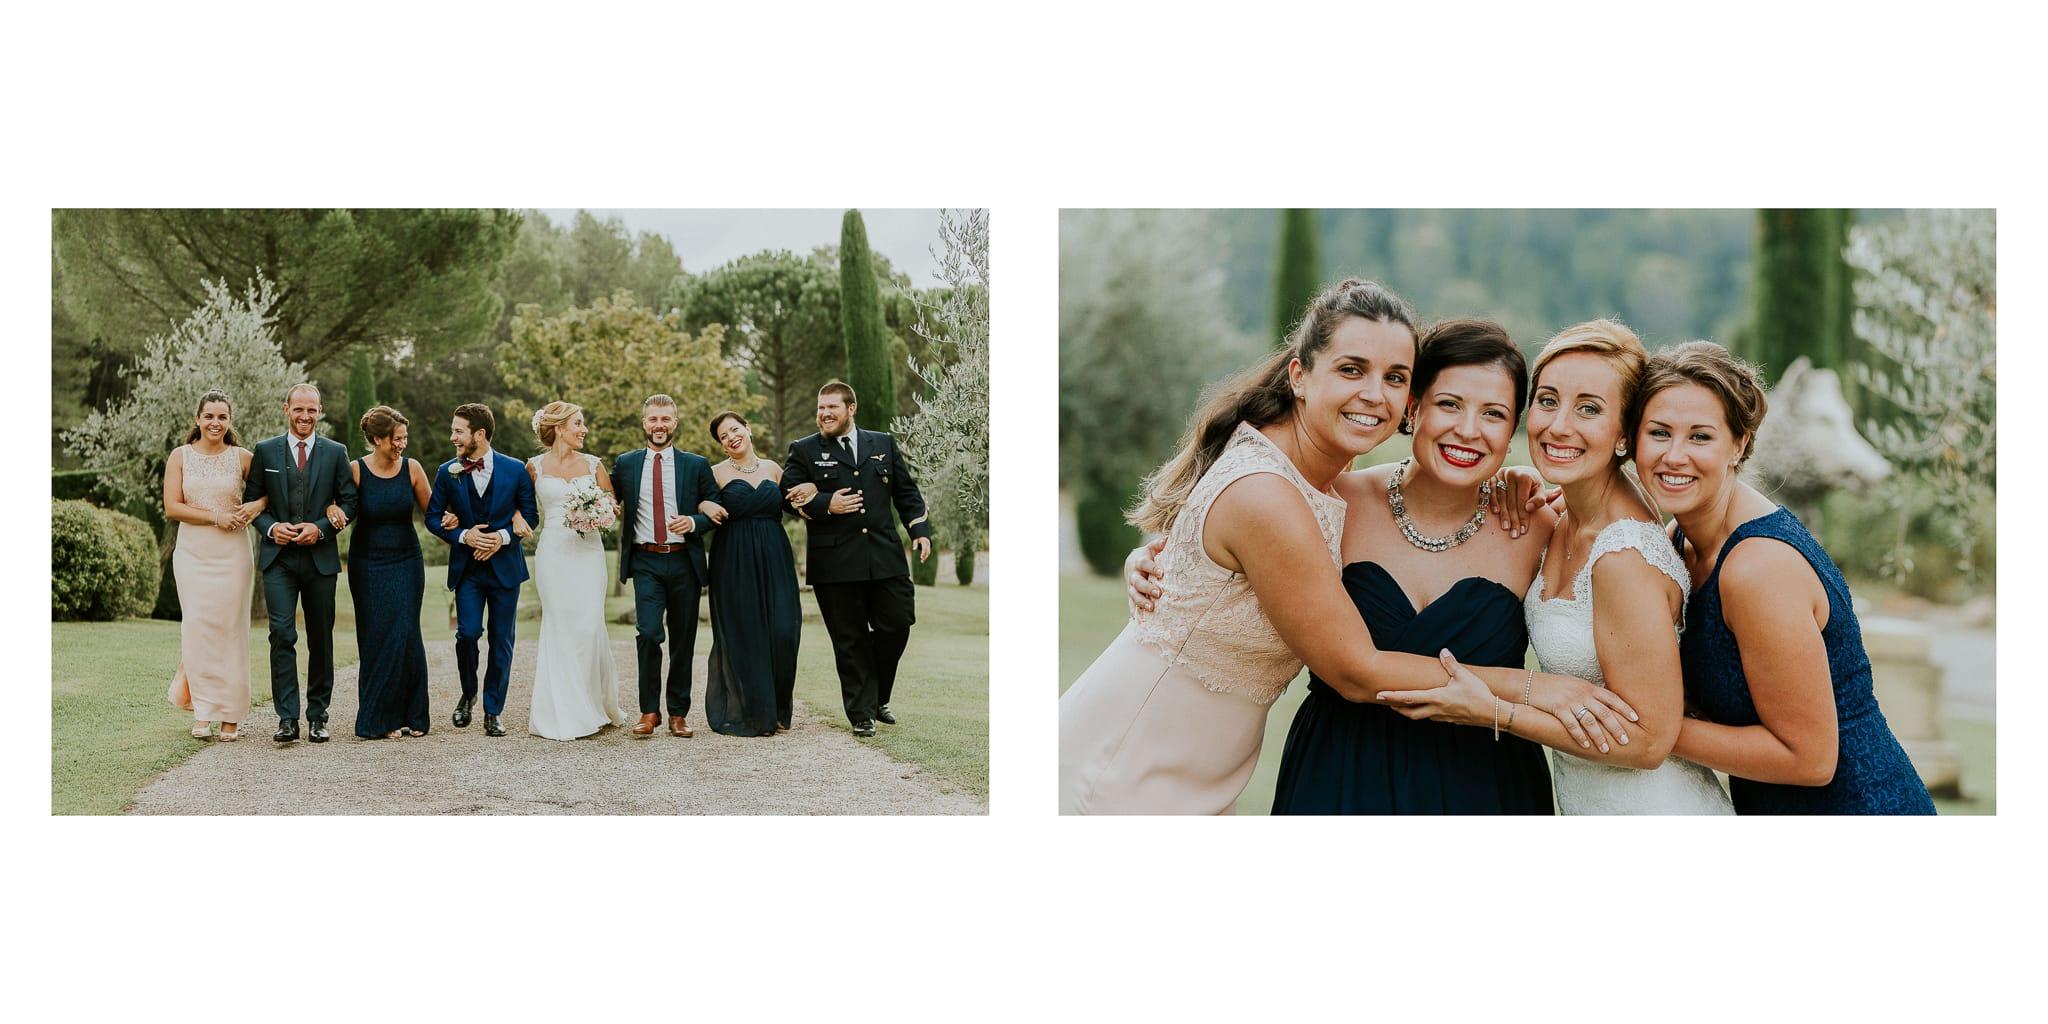 Costi-Moiceanu-Photographer-CM-Photography-Wedding-Mariage-French-Riviera-Cote-D-Azur-Alpes-Maritimes-Weding-Album-Design-13